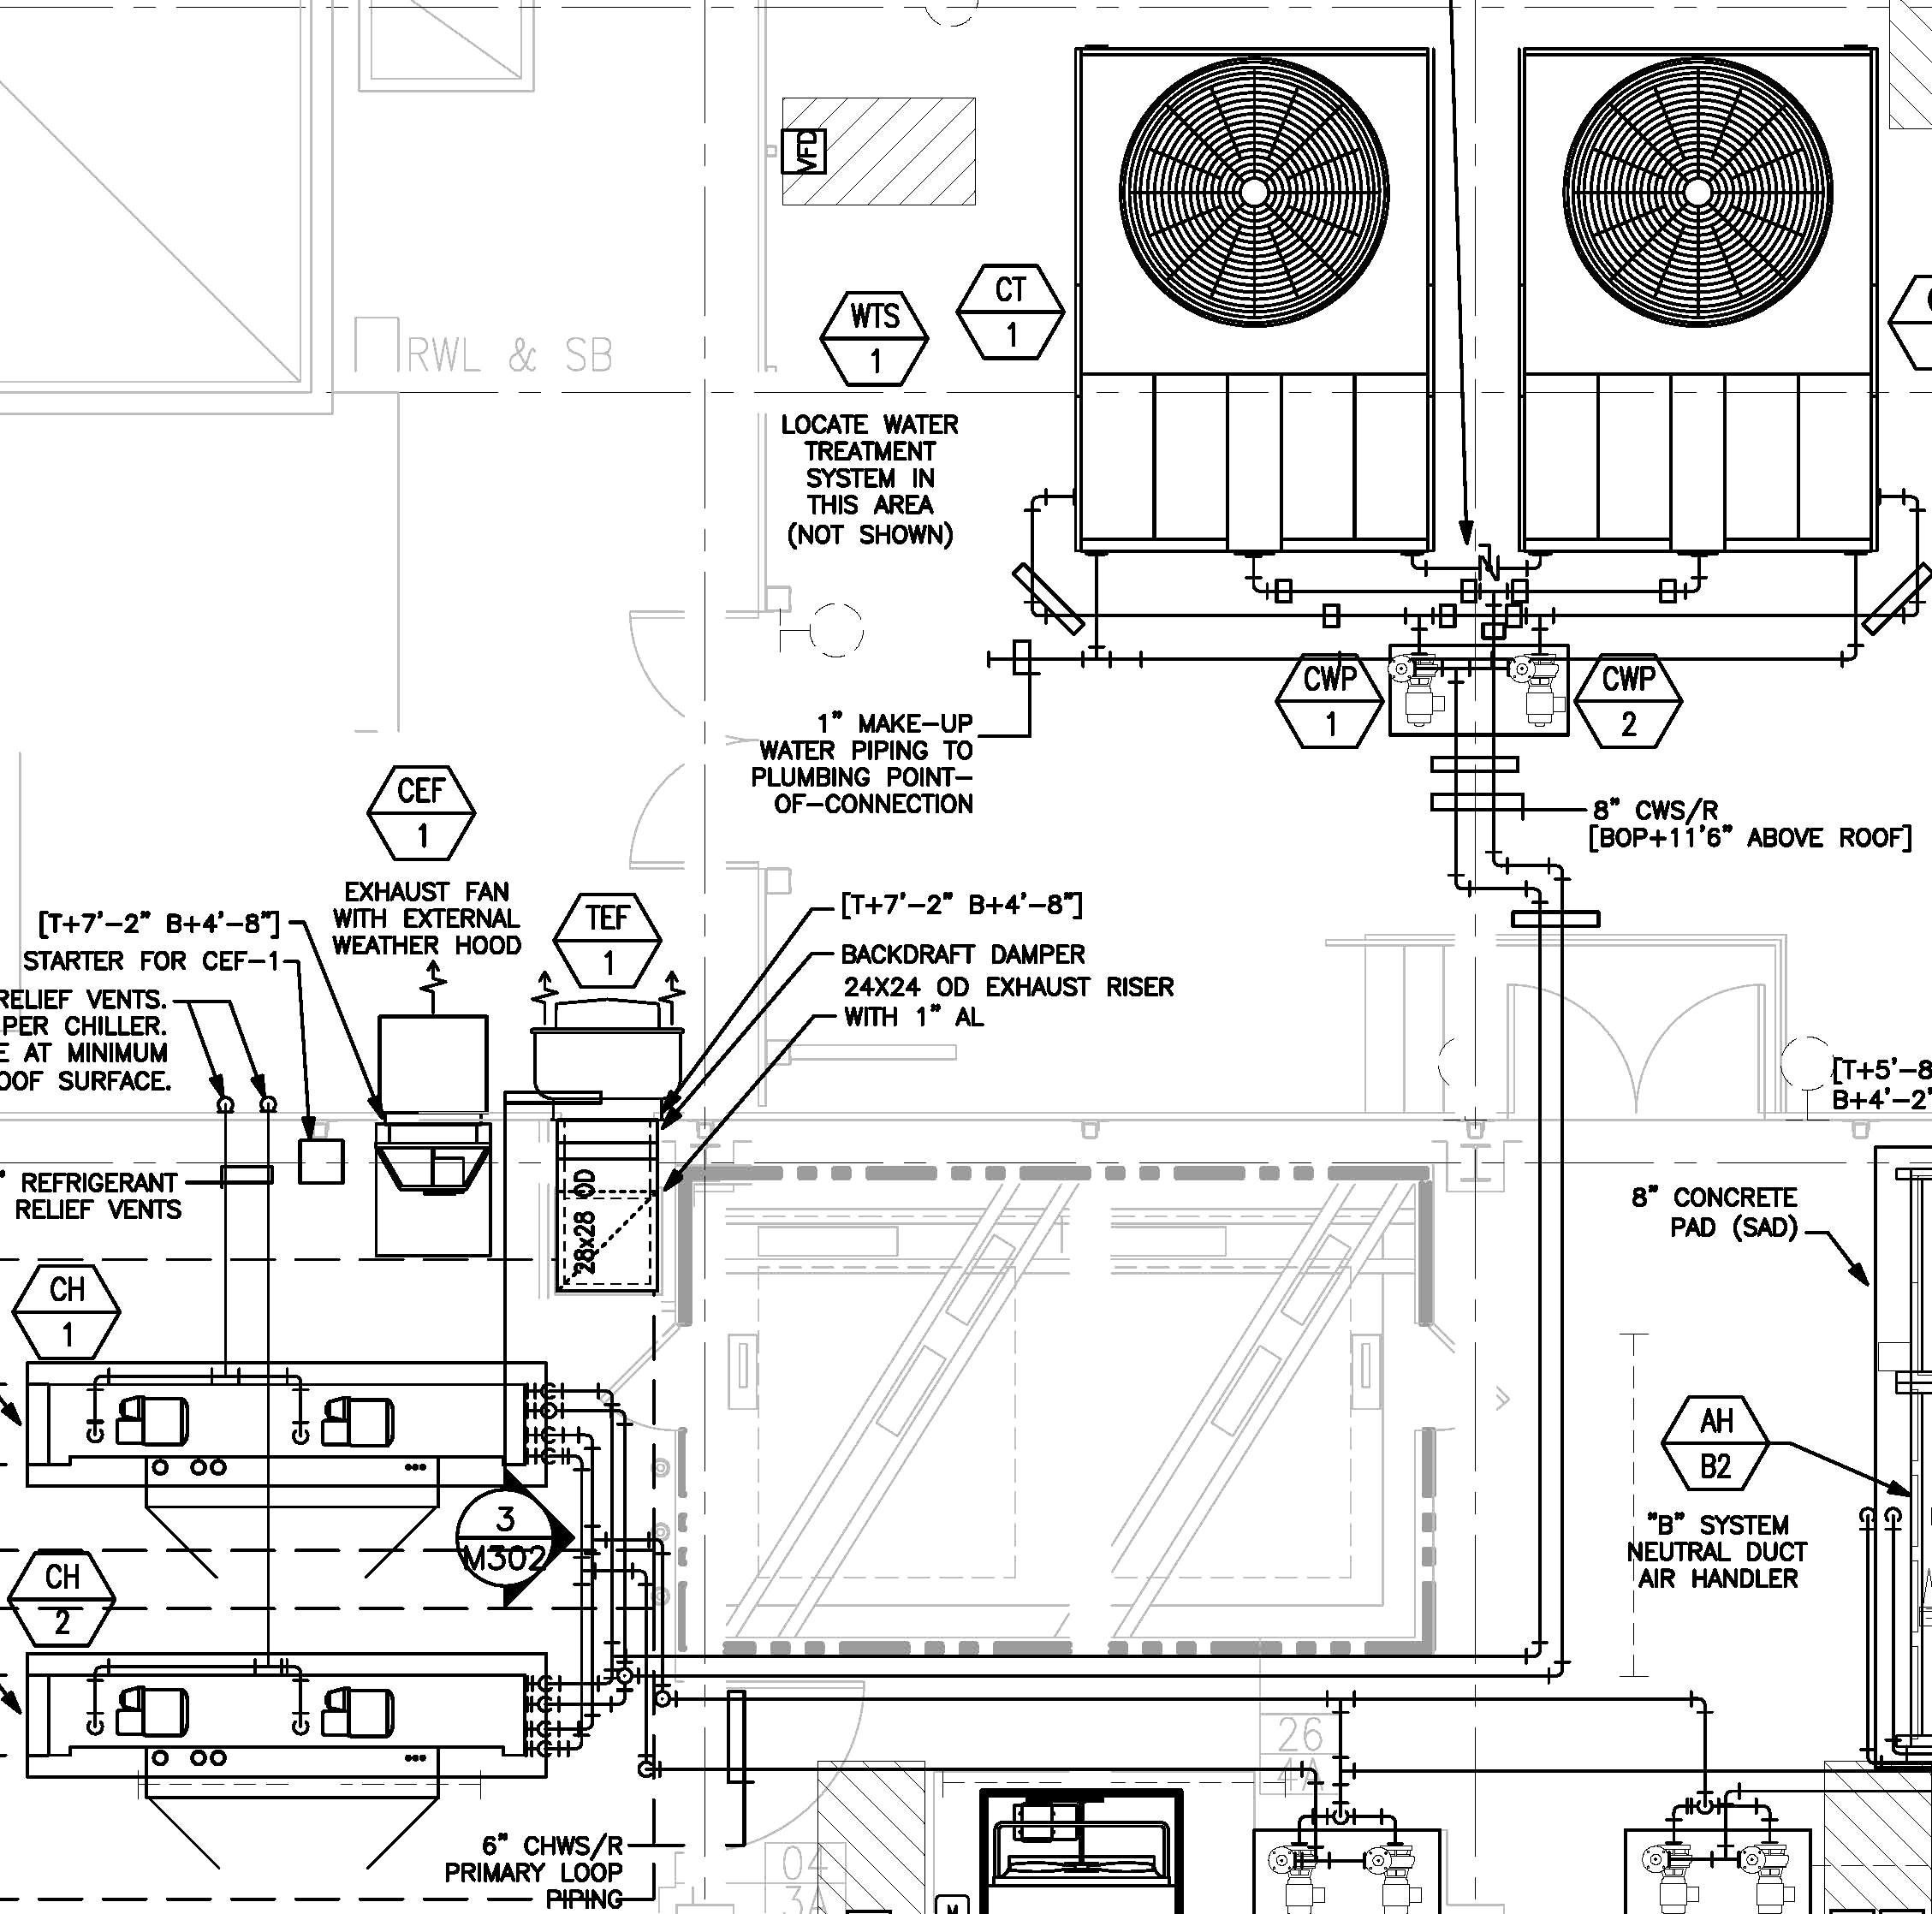 Semi Truck Suspension Diagram Air Line Diagram Peterbilt Truck Car Wiring Diagrams Explained • Of Semi Truck Suspension Diagram